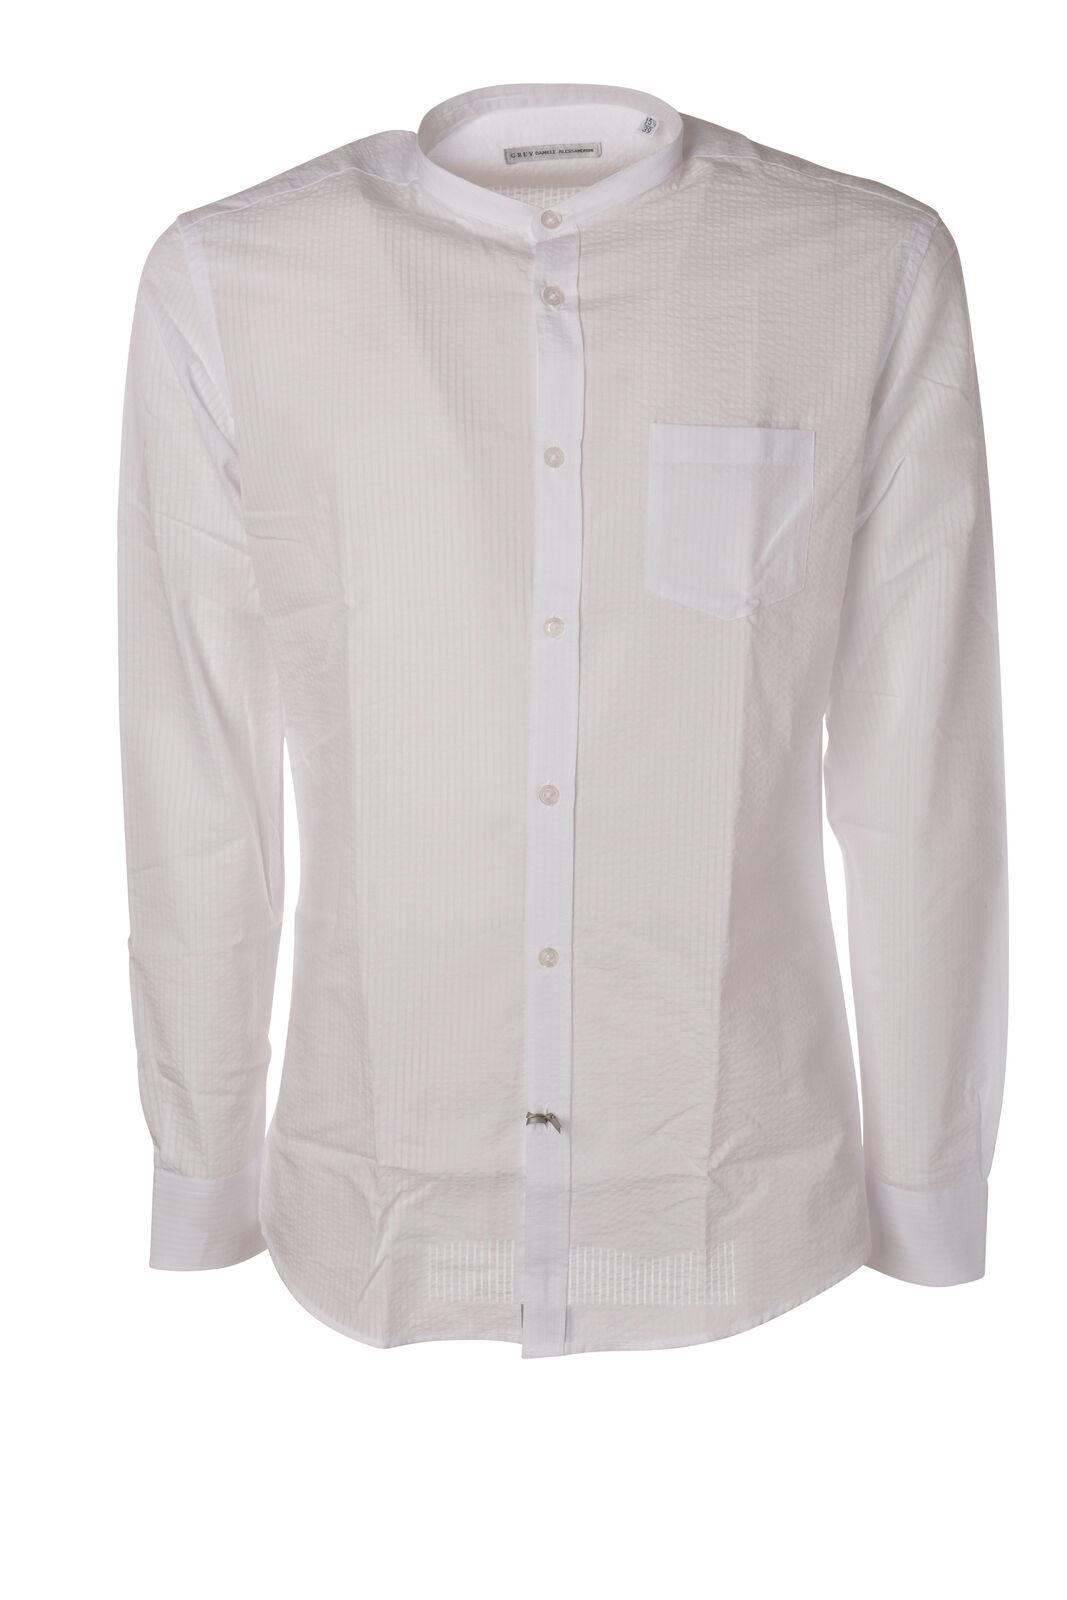 Daniele Alessandrini - Shirts-Shirt - Man - White - 5912409C191318